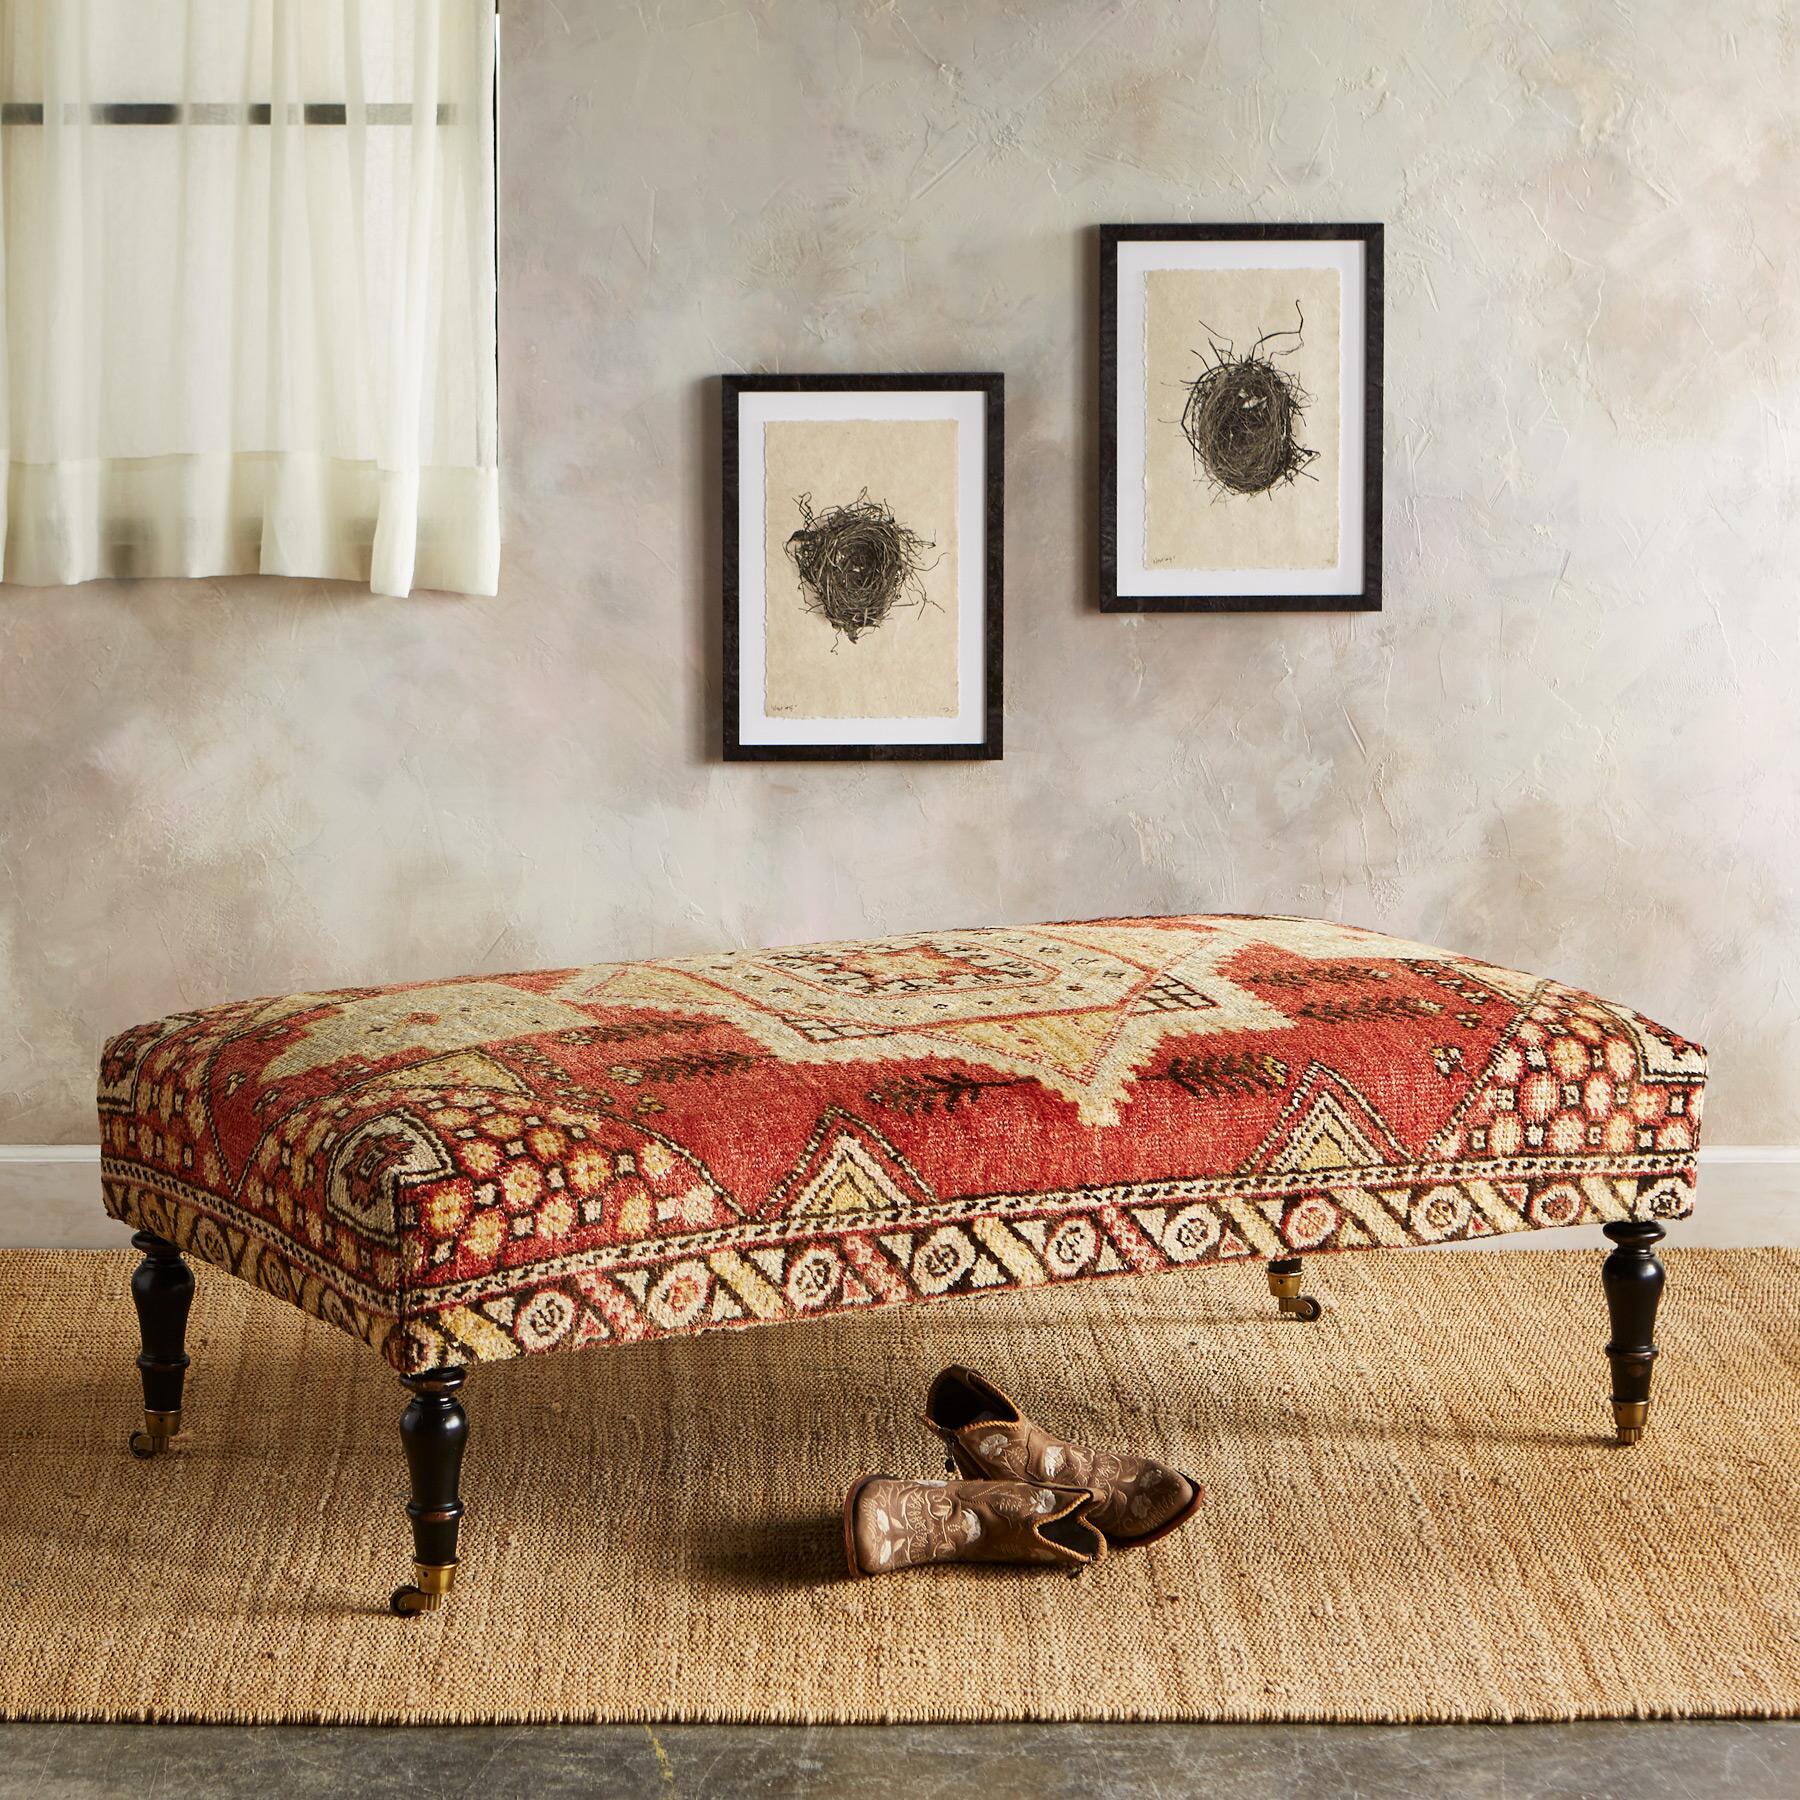 IZMIT TURKISH CARPET BENCH: View 1